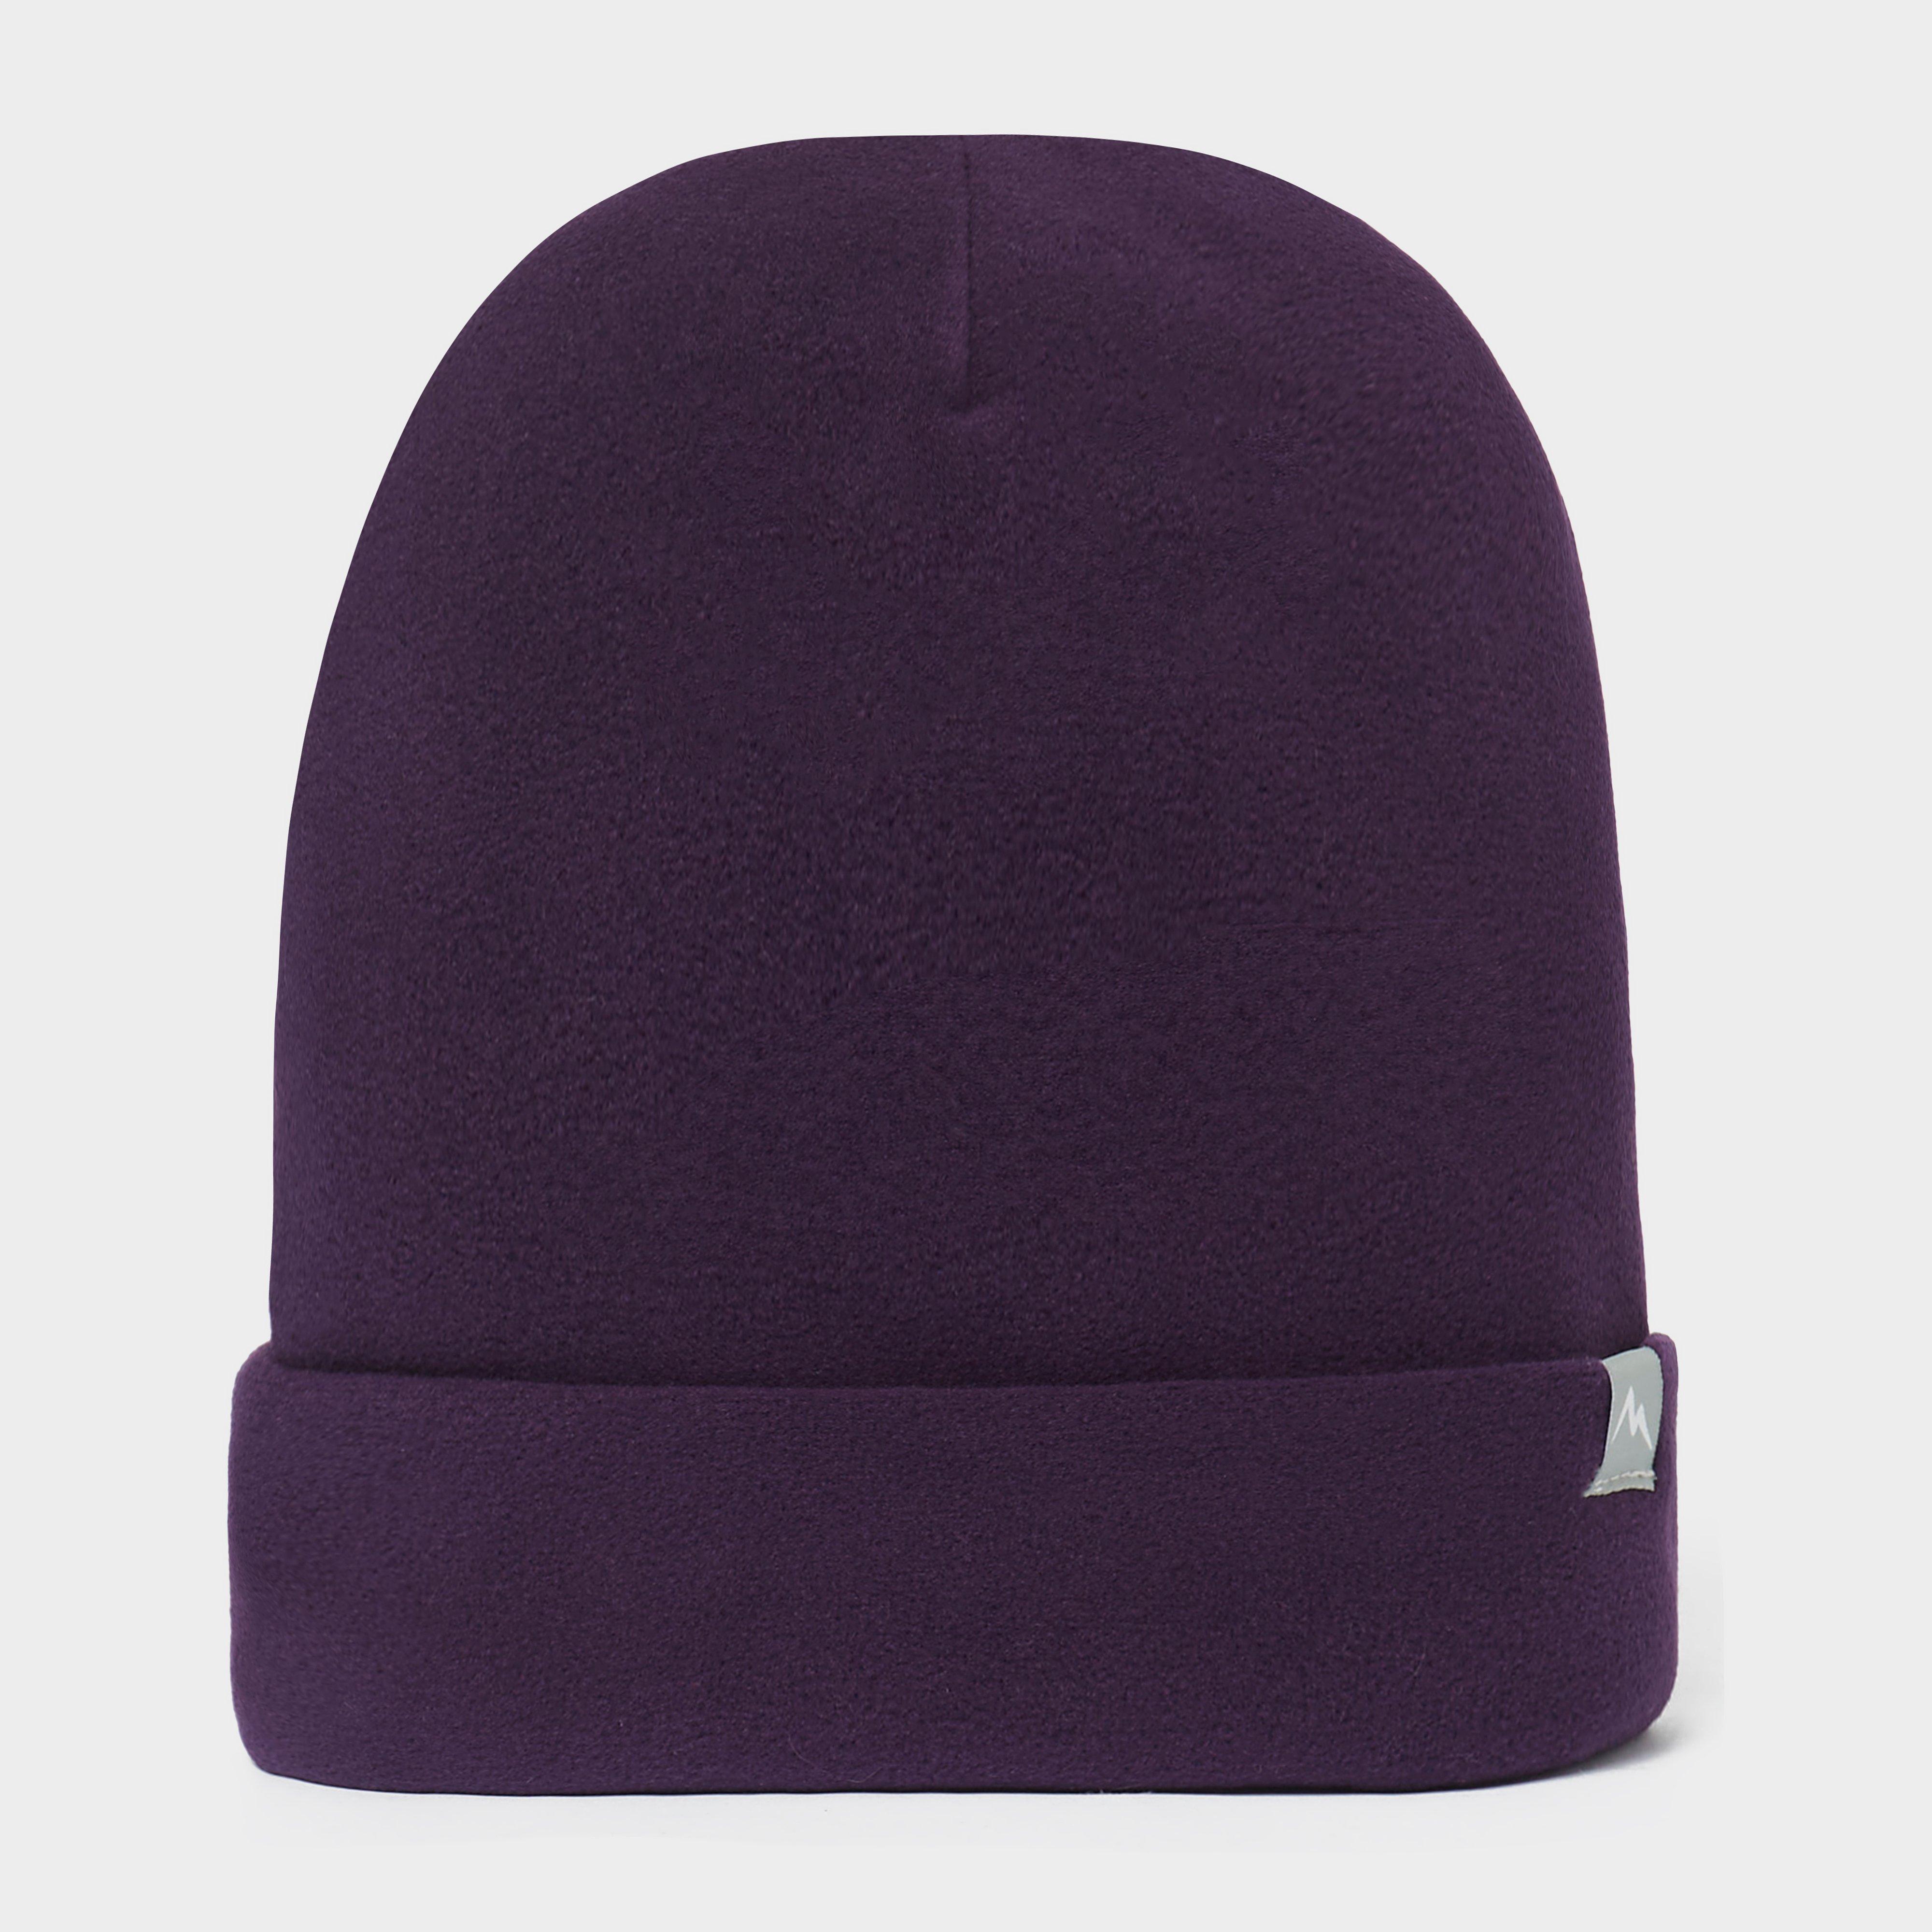 Photo of Peter storm girls thinsulate hat - purple- purple